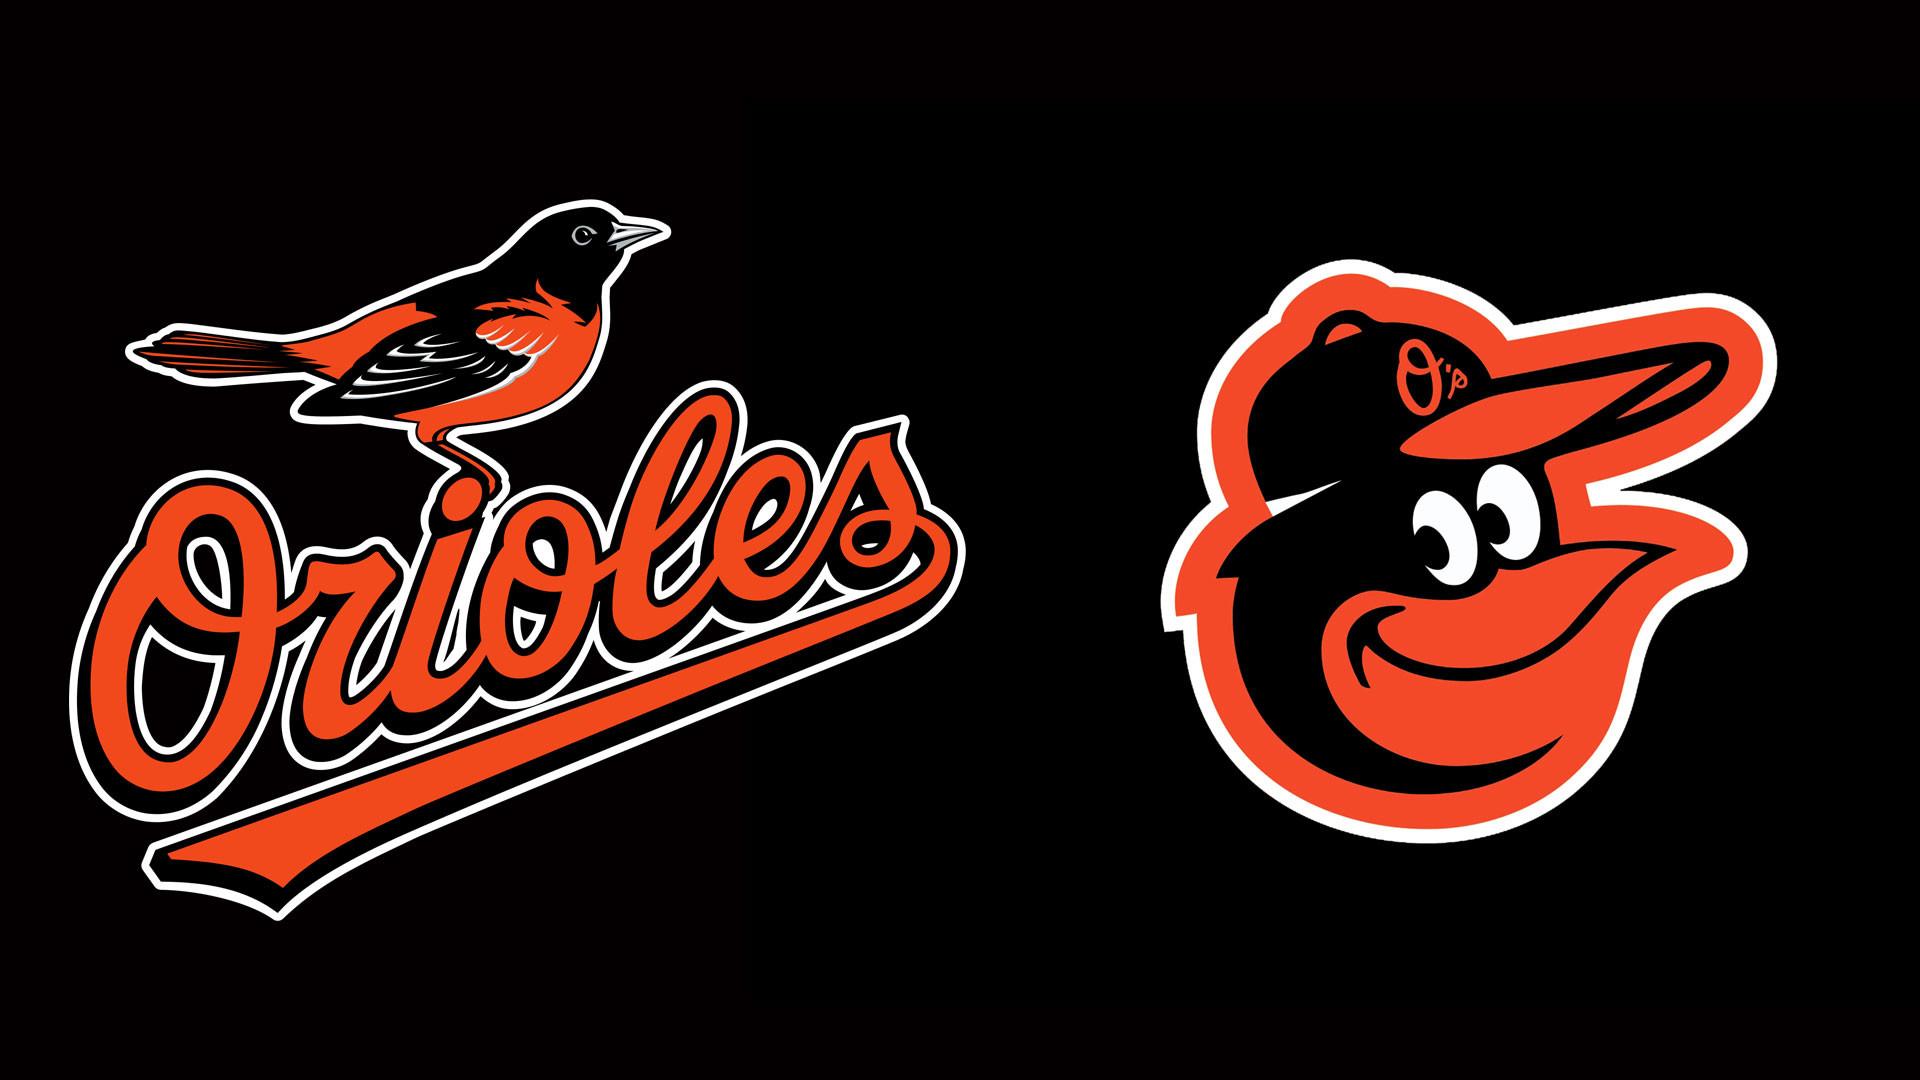 11 HD Baltimore Orioles Desktop Wallpapers For Free Download